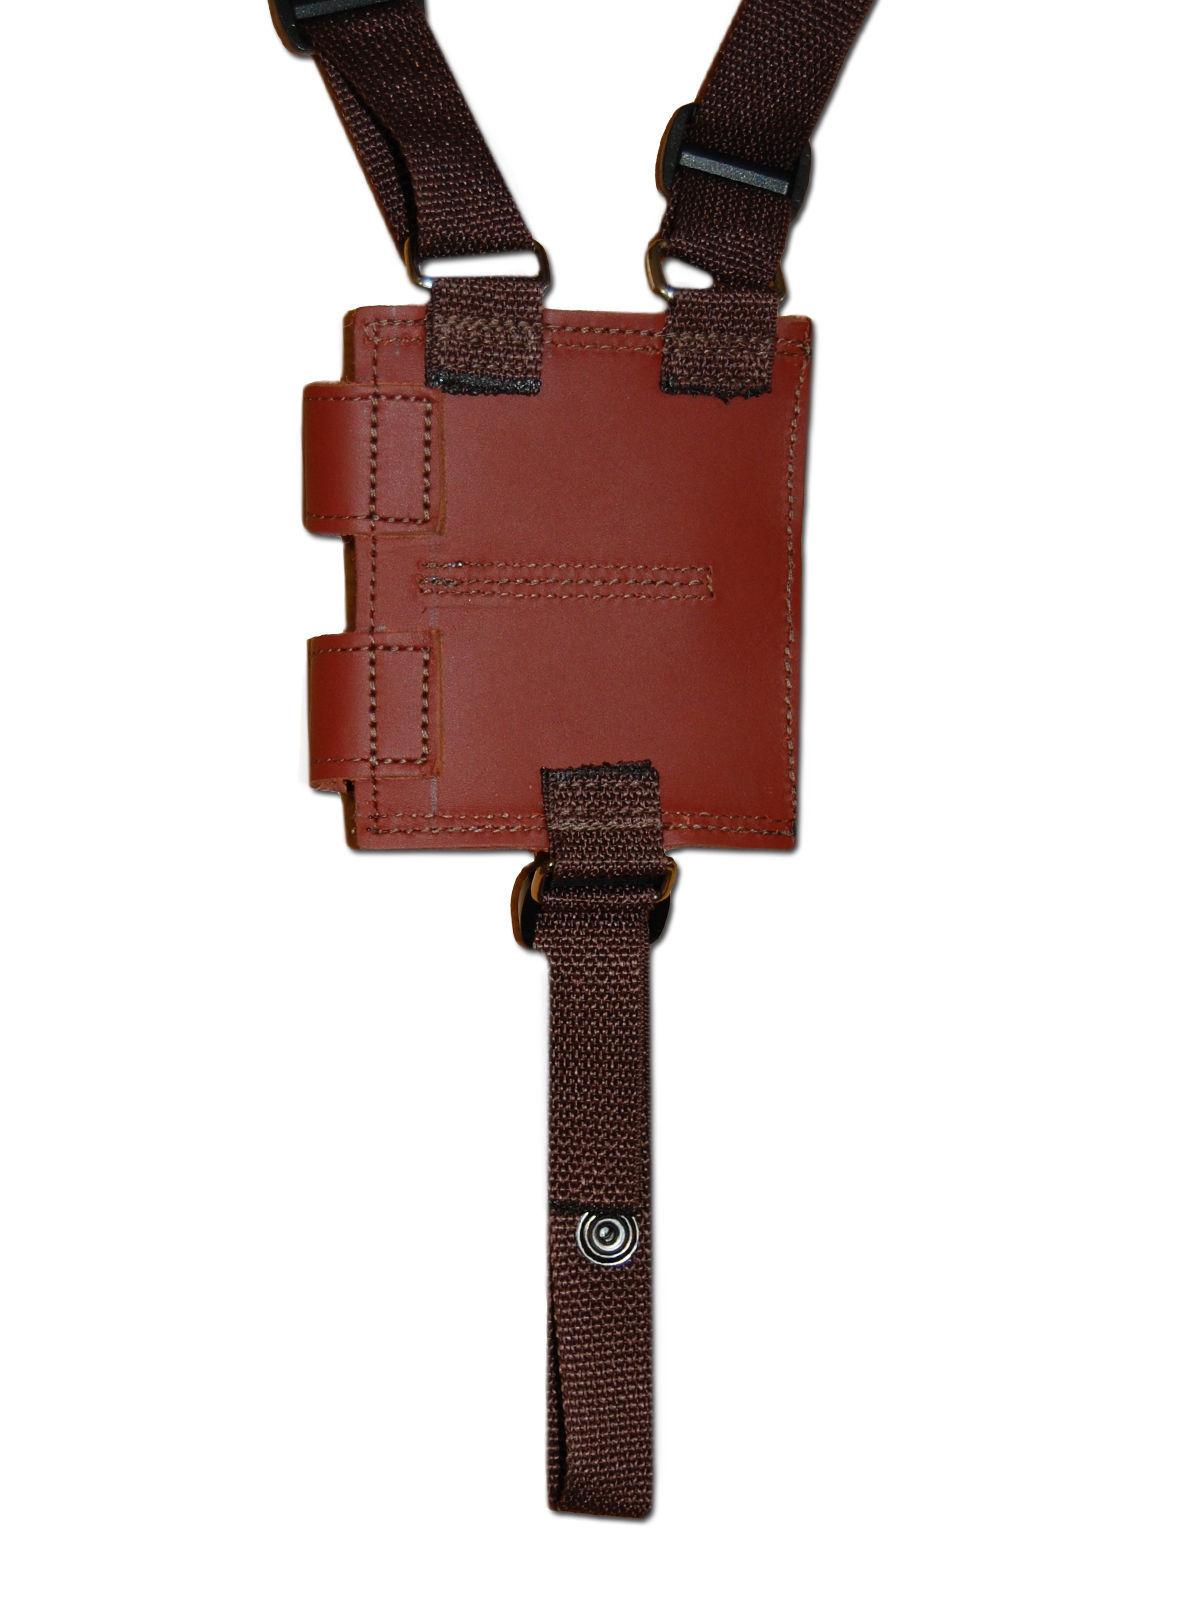 NEW Burgundy Leather Shoulder Holster w/Dbl Mag Pouch Cobra, Daewoo Mini-Pocket